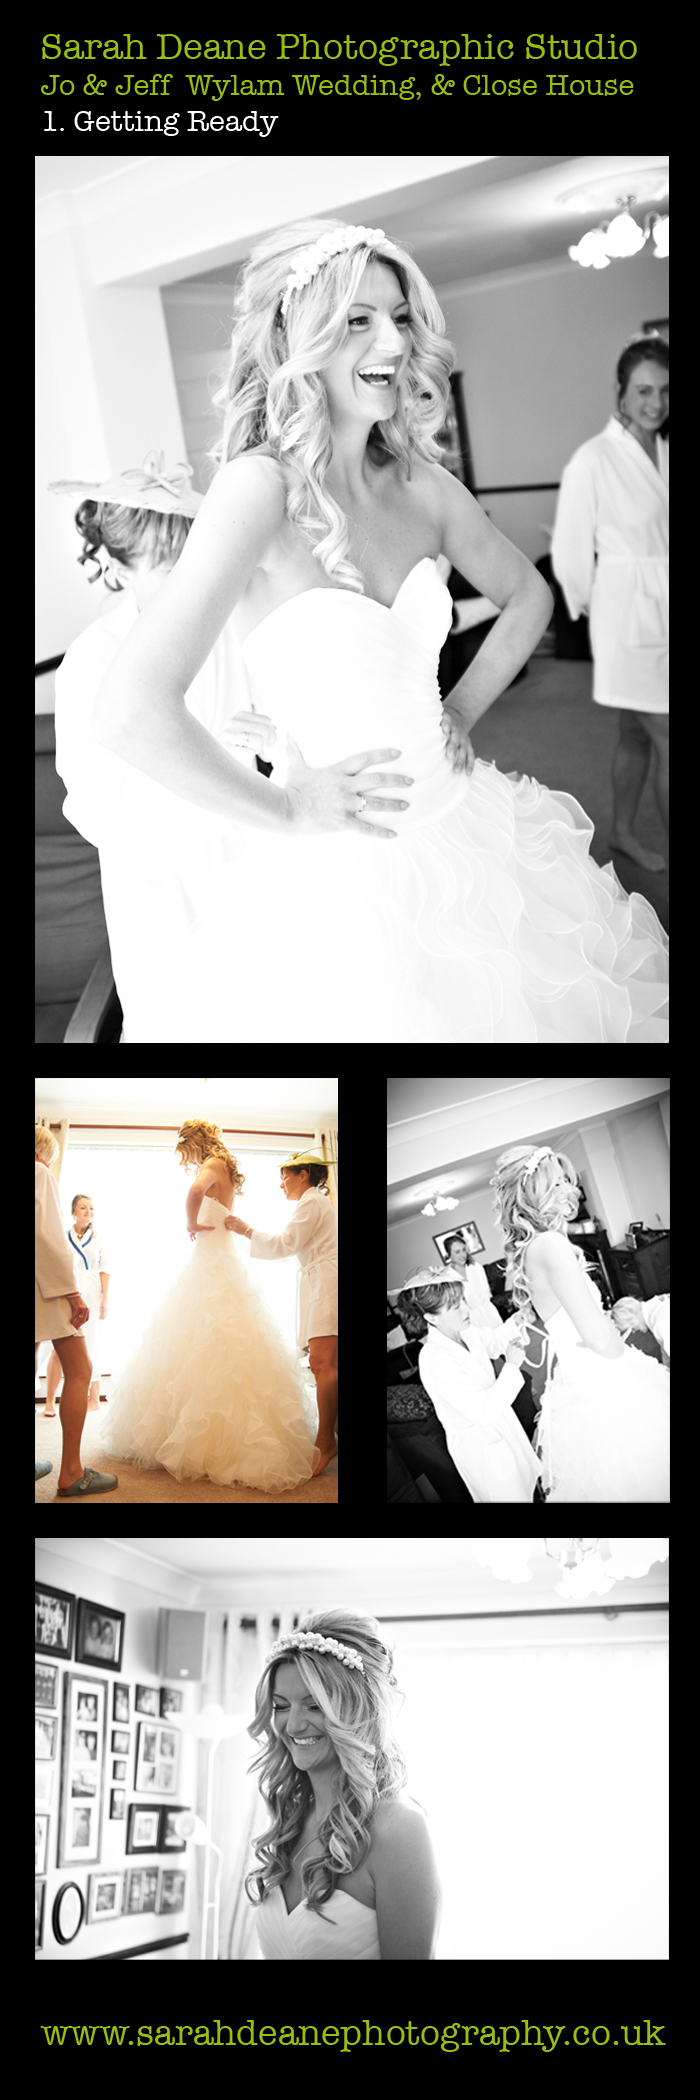 close house northumberland wedding jo & jeff gettting ready 1